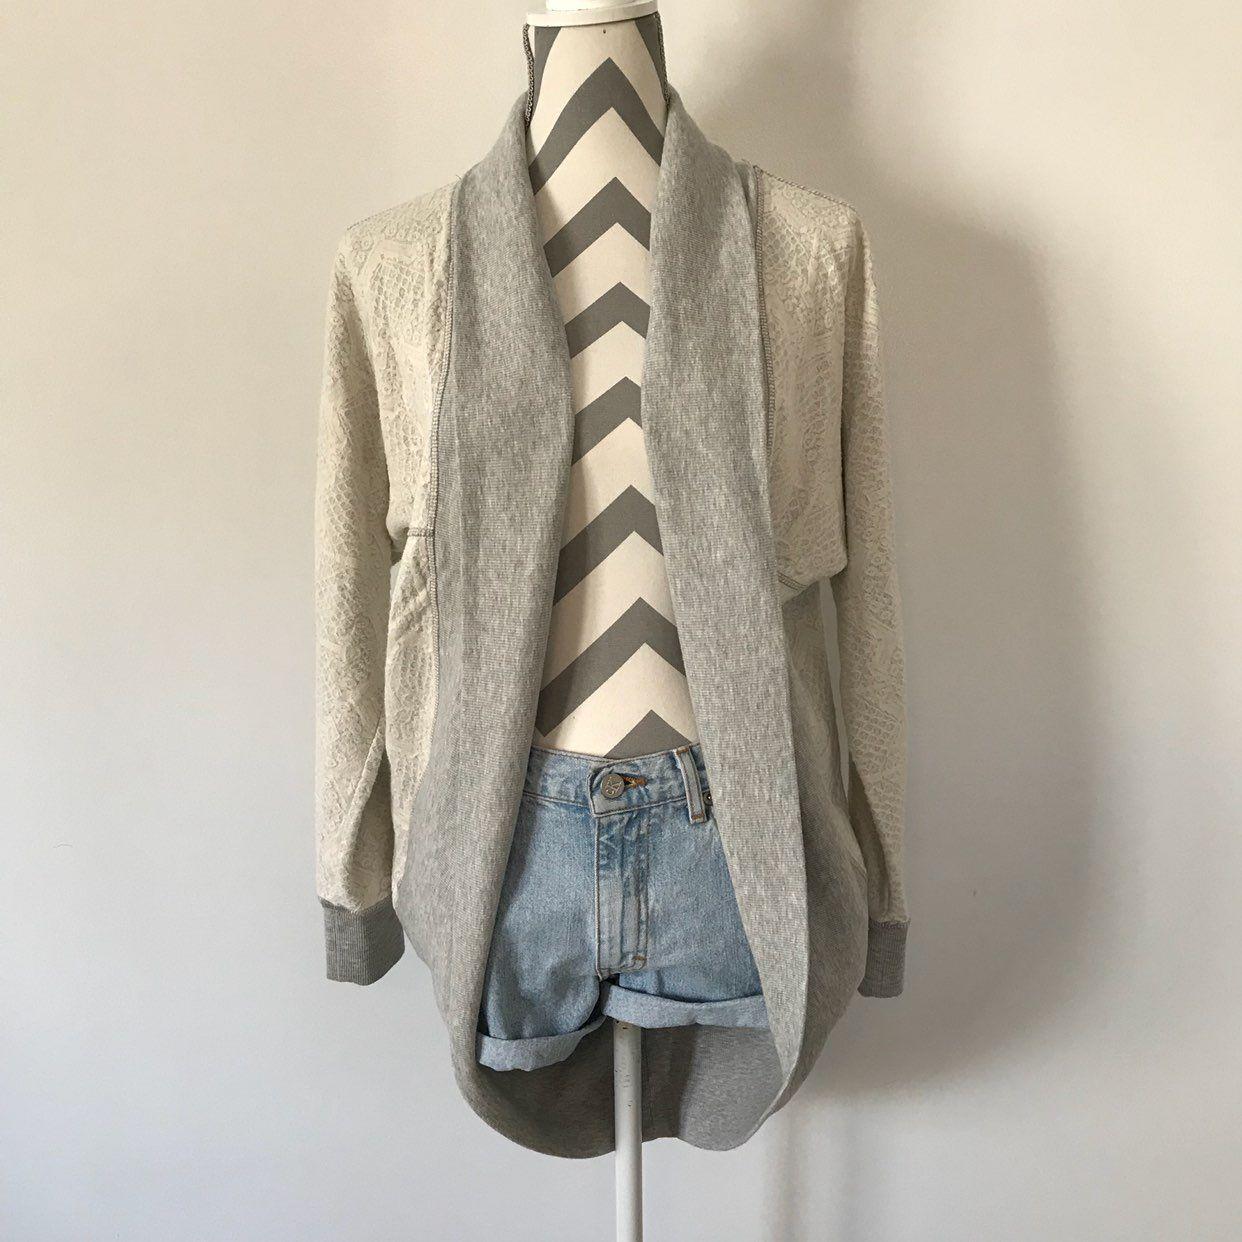 Gray Lace Cardigan - Mercari: BUY & SELL THINGS YOU LOVE